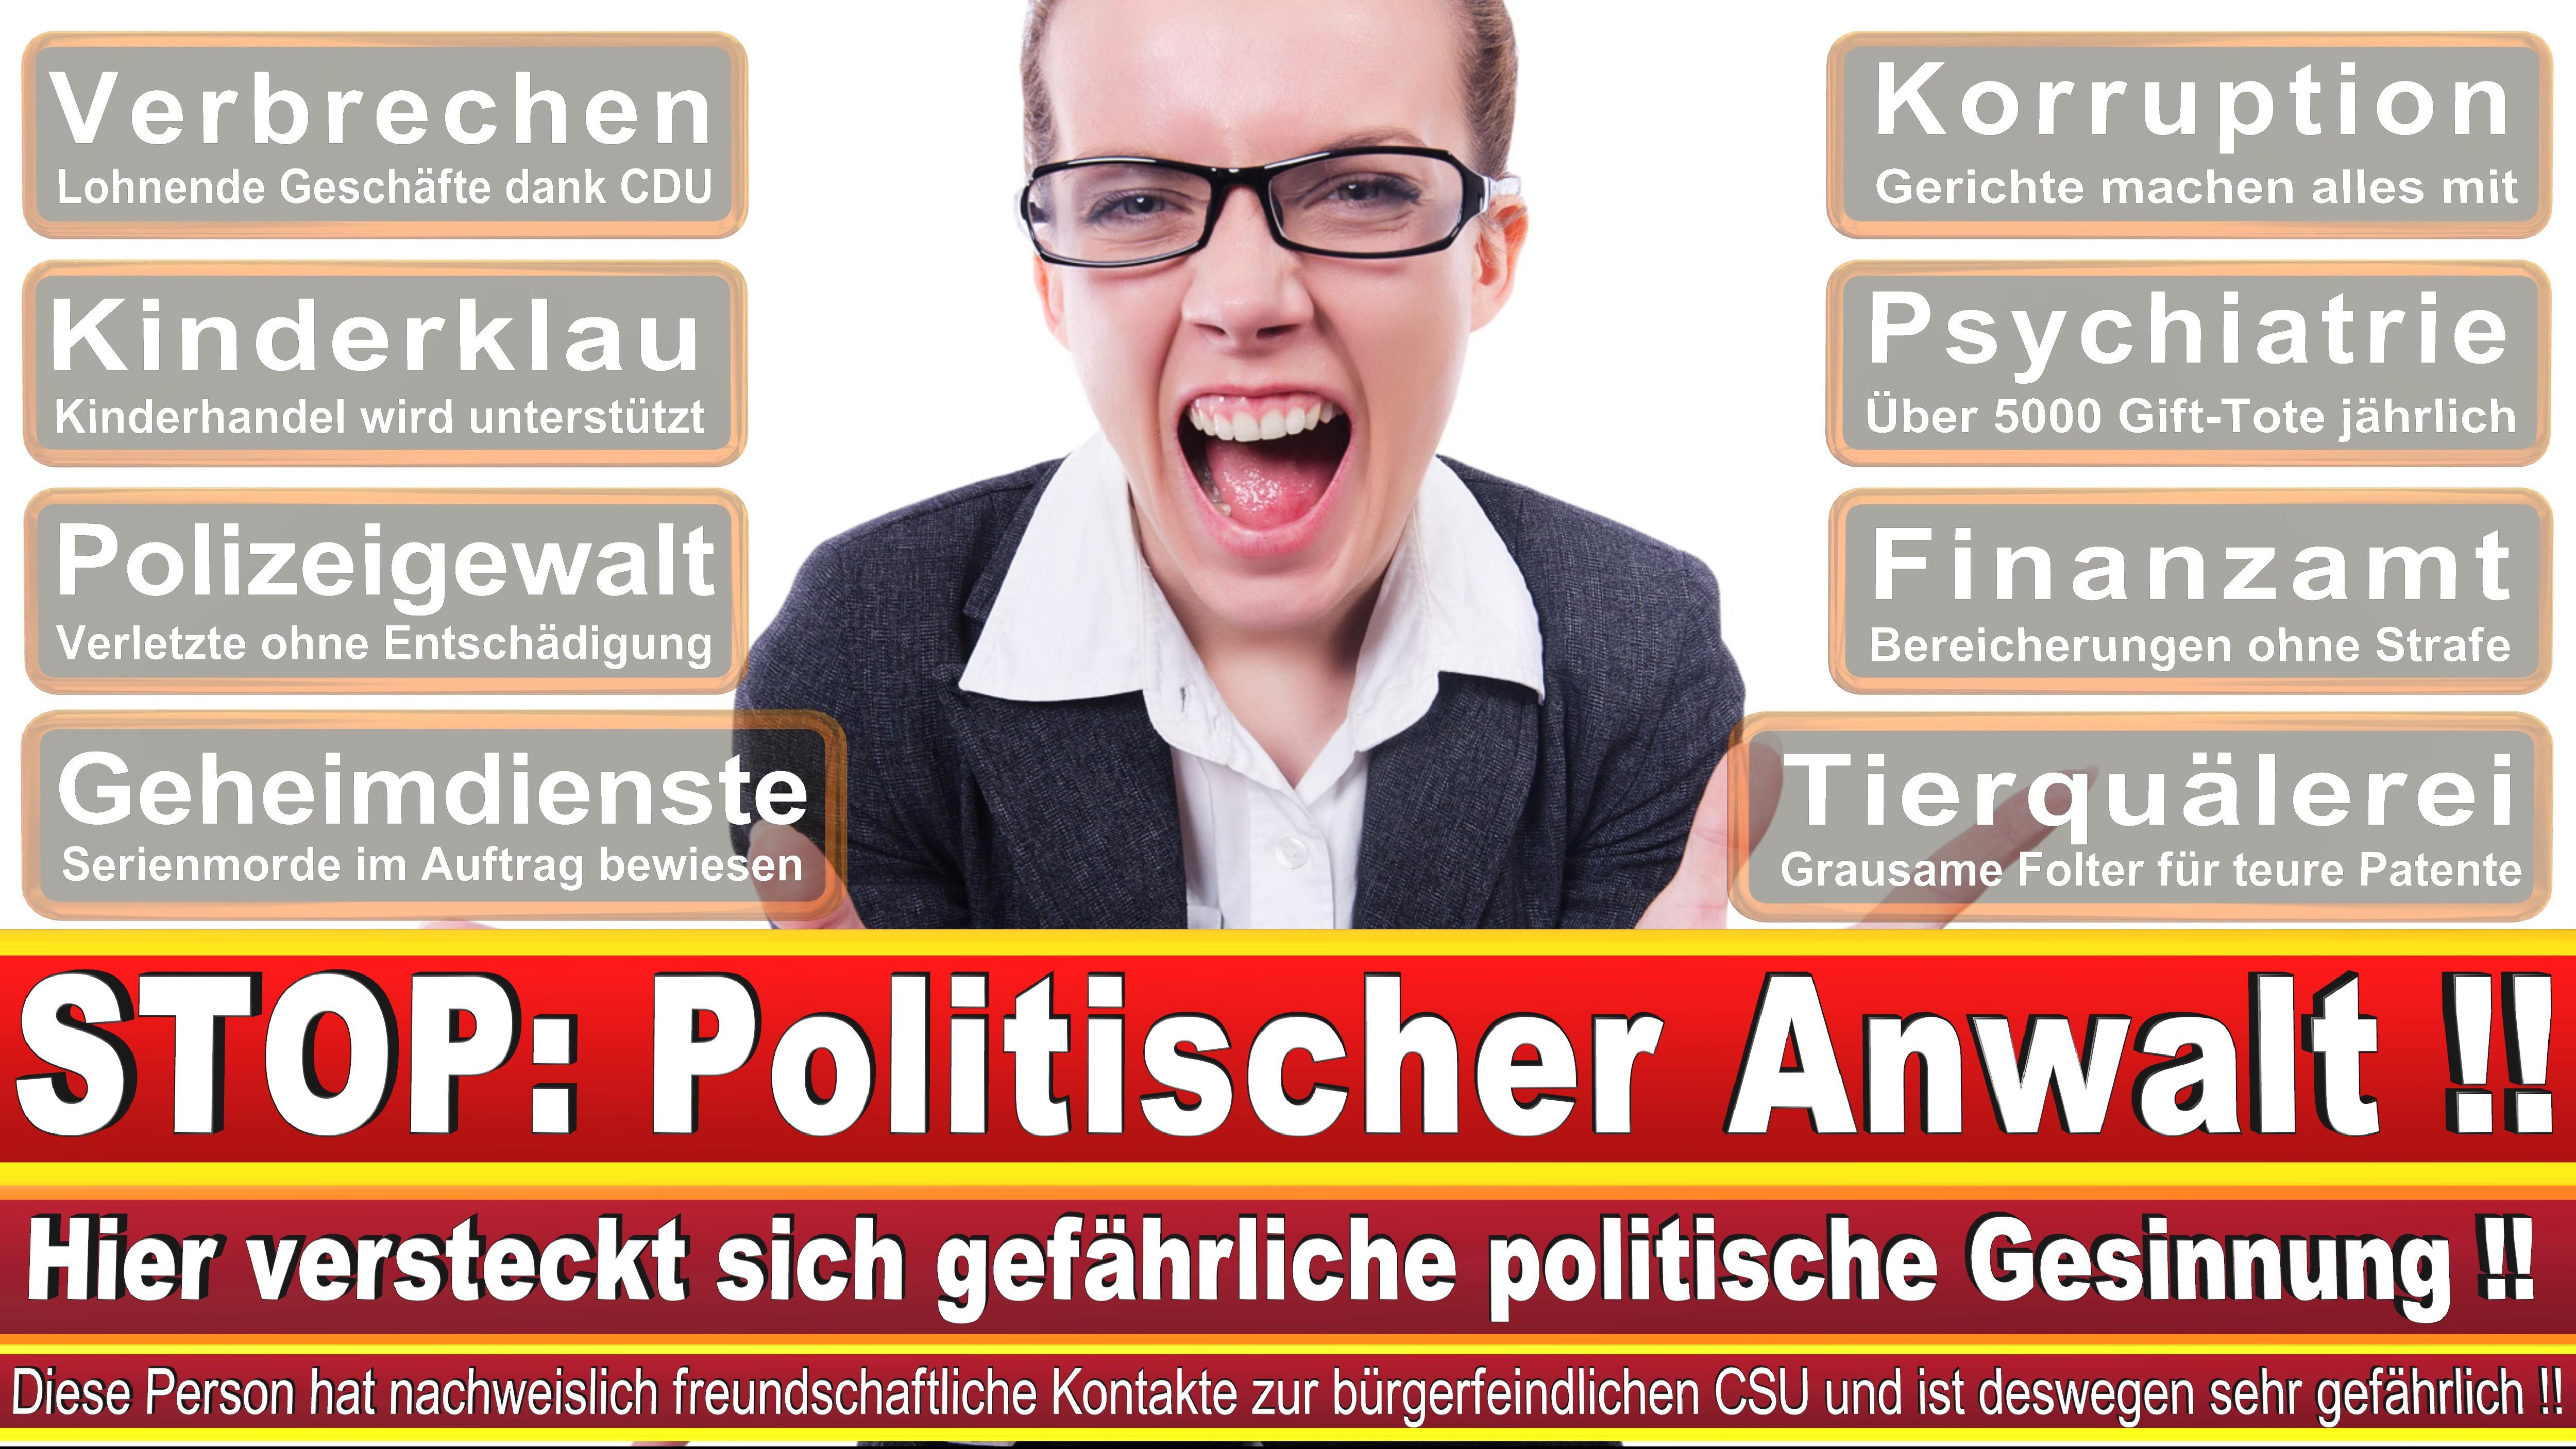 Rechtsanwalt Jürgen Steinhofer Regensburg Rechtsanwalt Zertifizierter Restrukturierungs Und Sanierungsexperte BLTS Rechtsanwälte